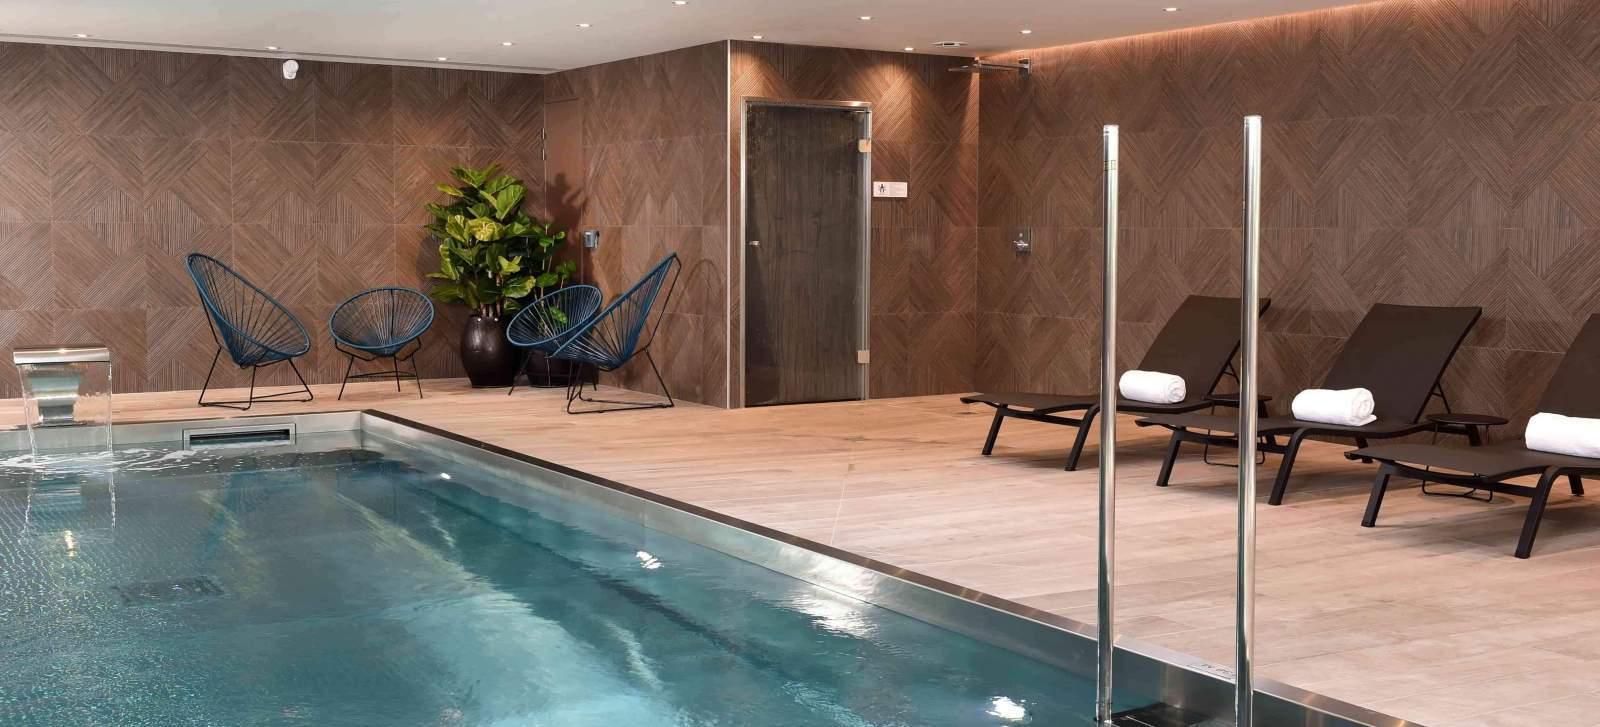 Hotel Oceania St Malo - Hotel 4 etoiles Saint Malo Spa.jpg